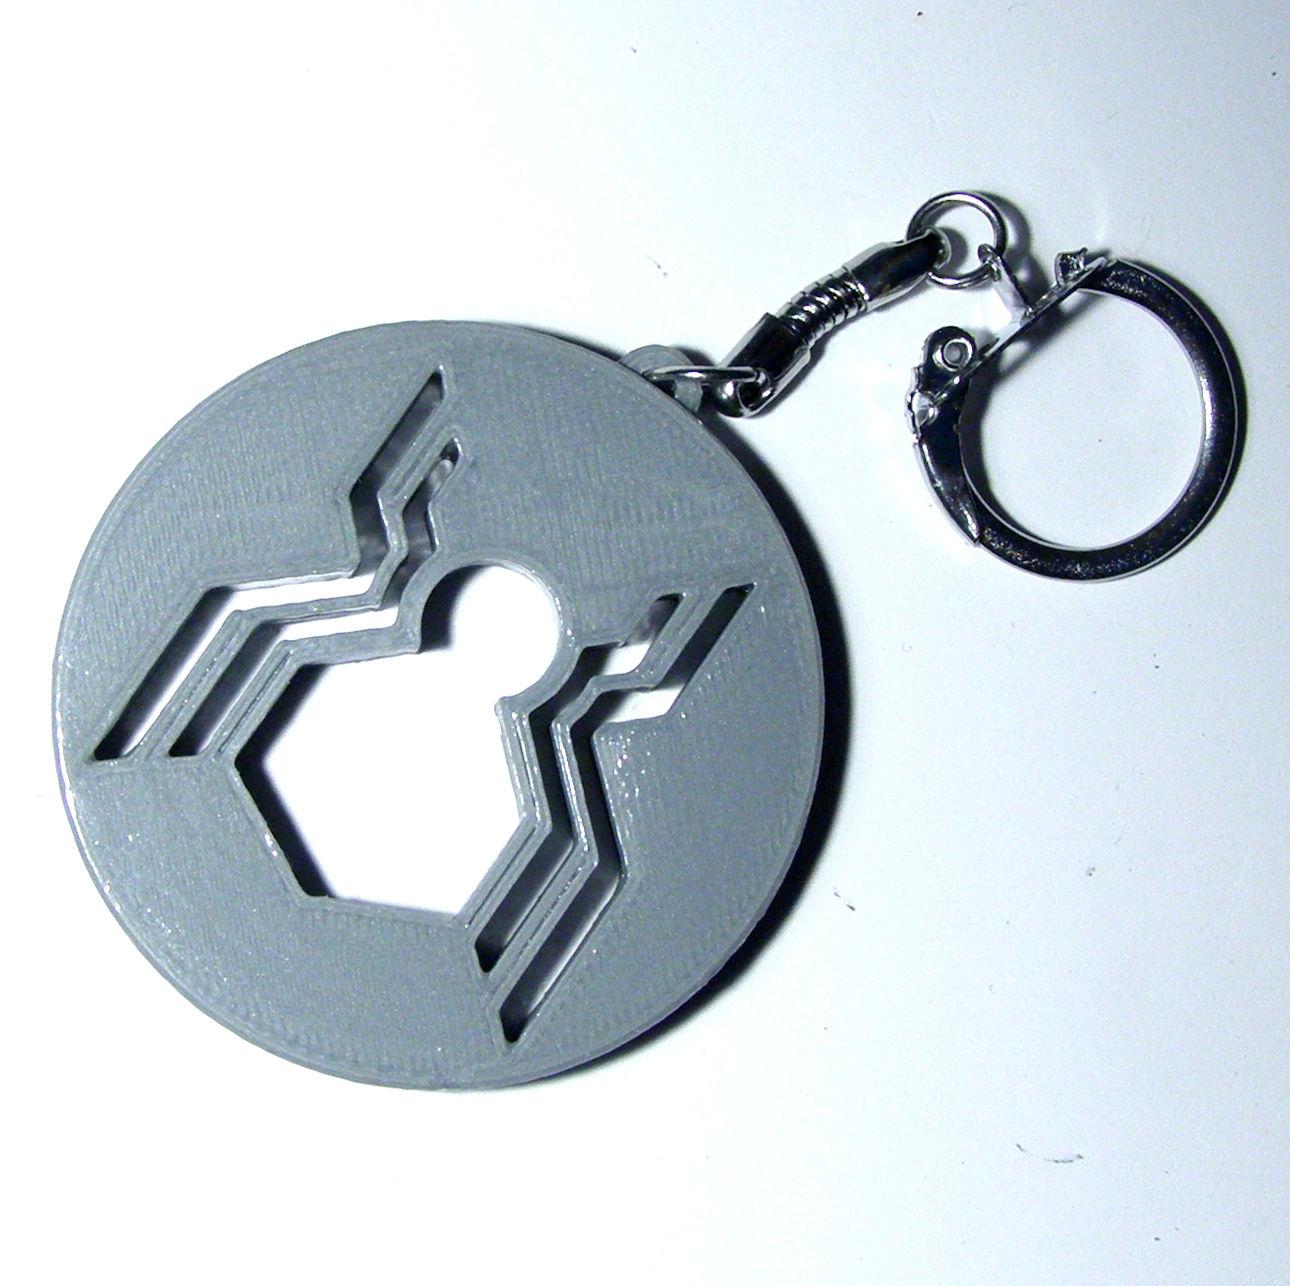 Spiderman Homecoming Keychain image